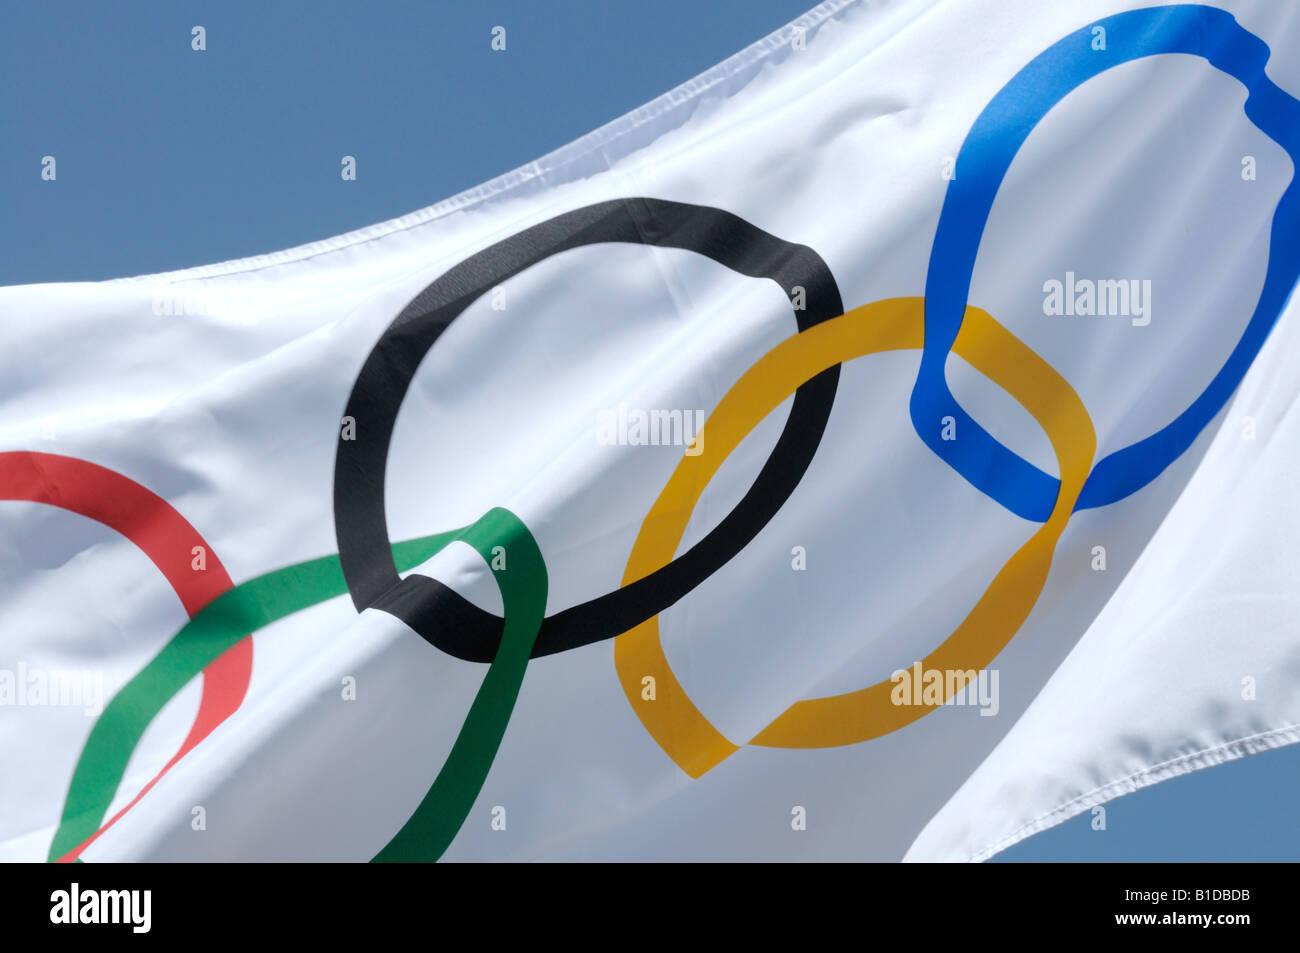 Olympic flag - Stock Image